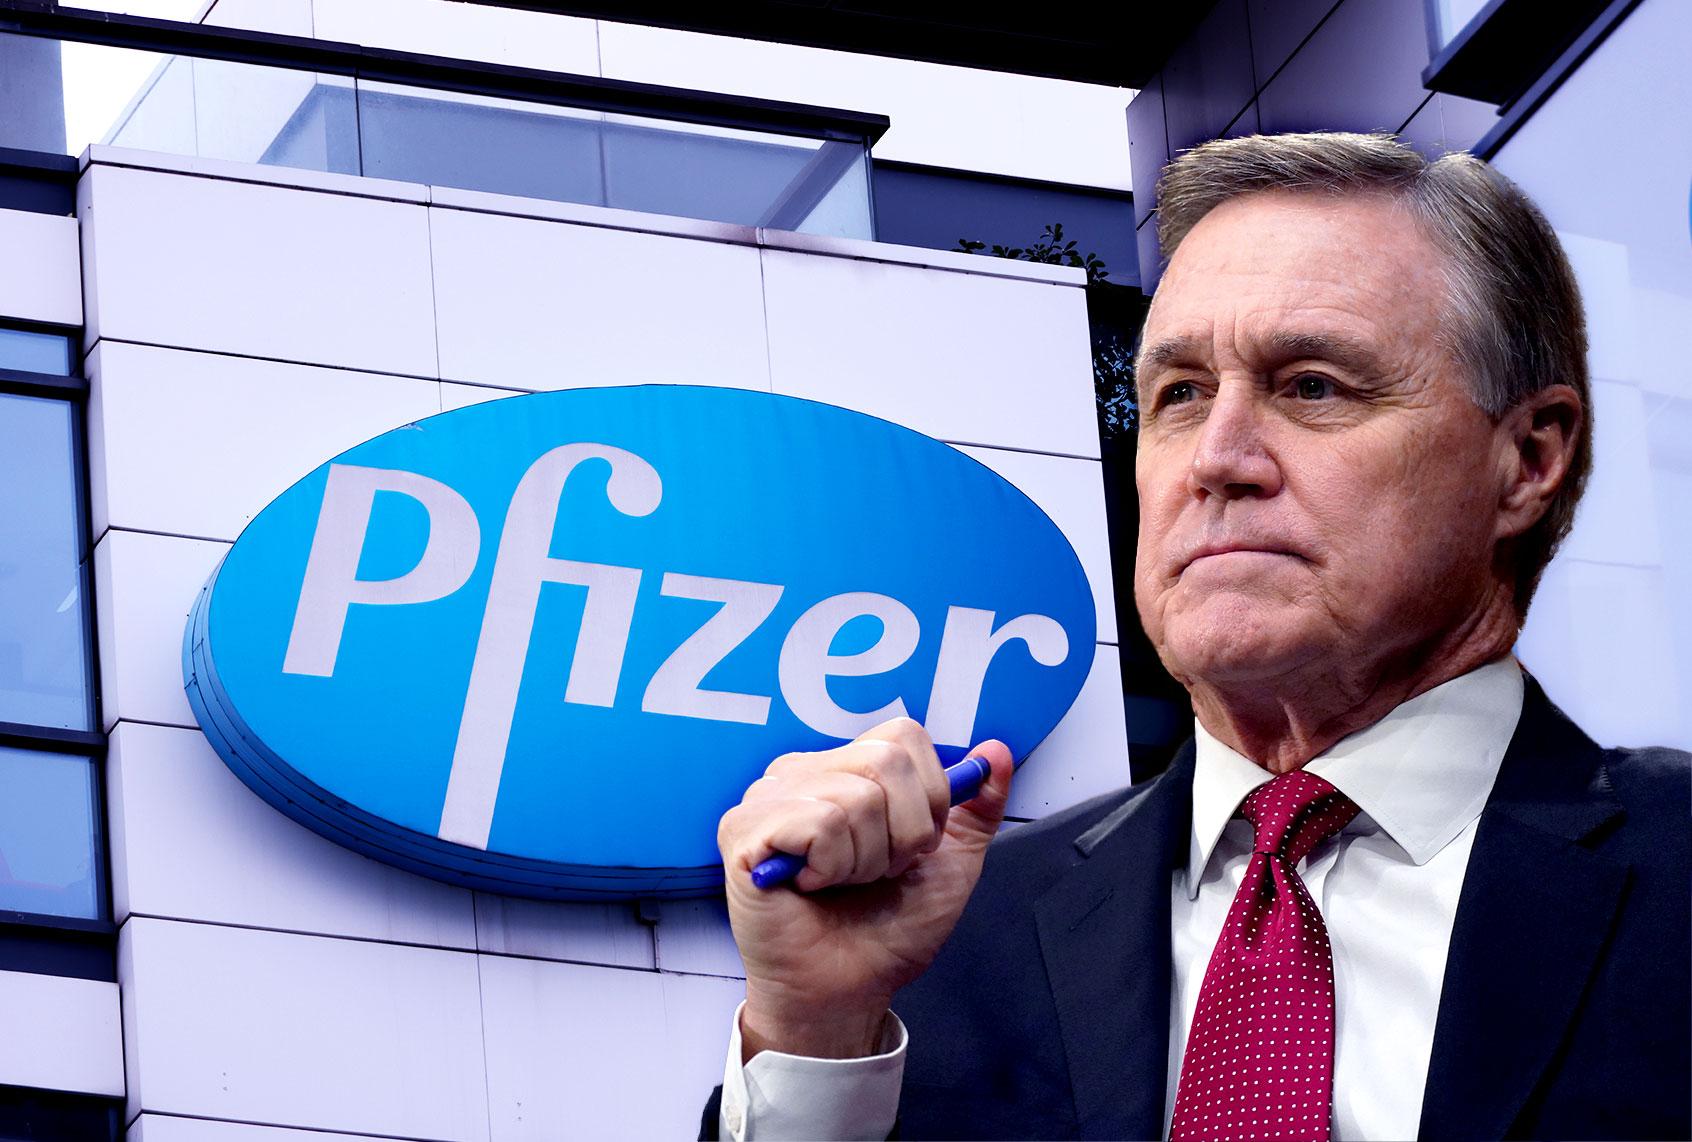 pfizer stock - photo #15